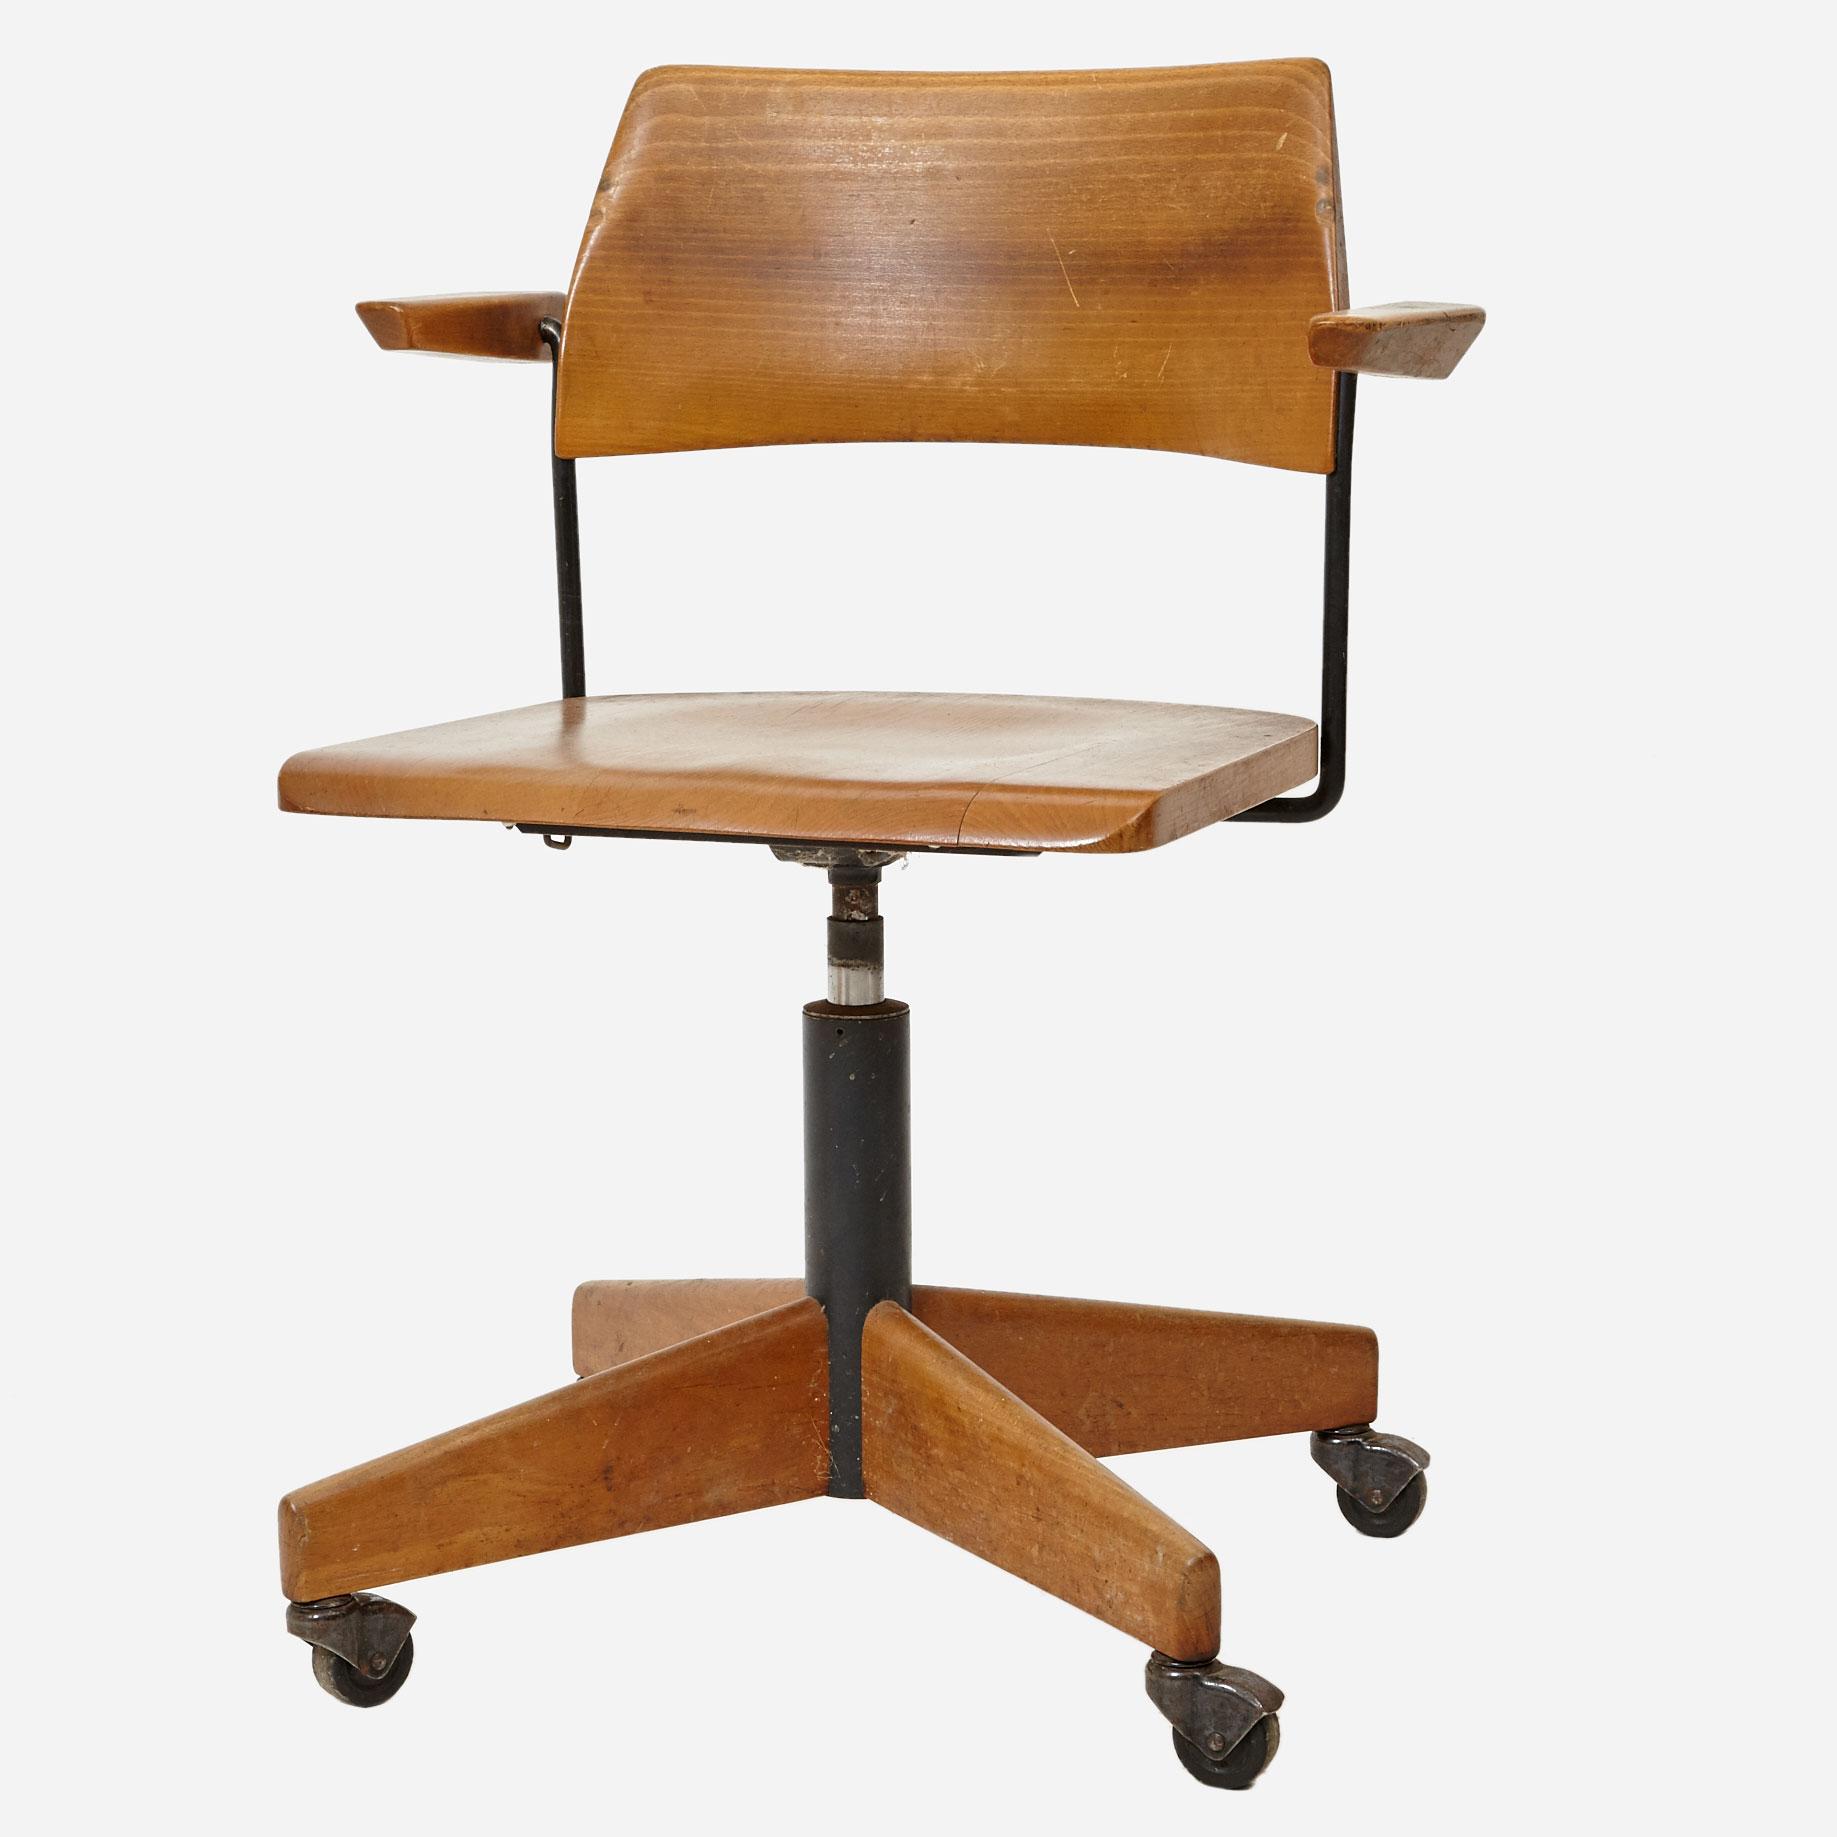 Bürostuhl Aus Buchenholz 1960er Jahre Möbel Zürich Vintagemöbel